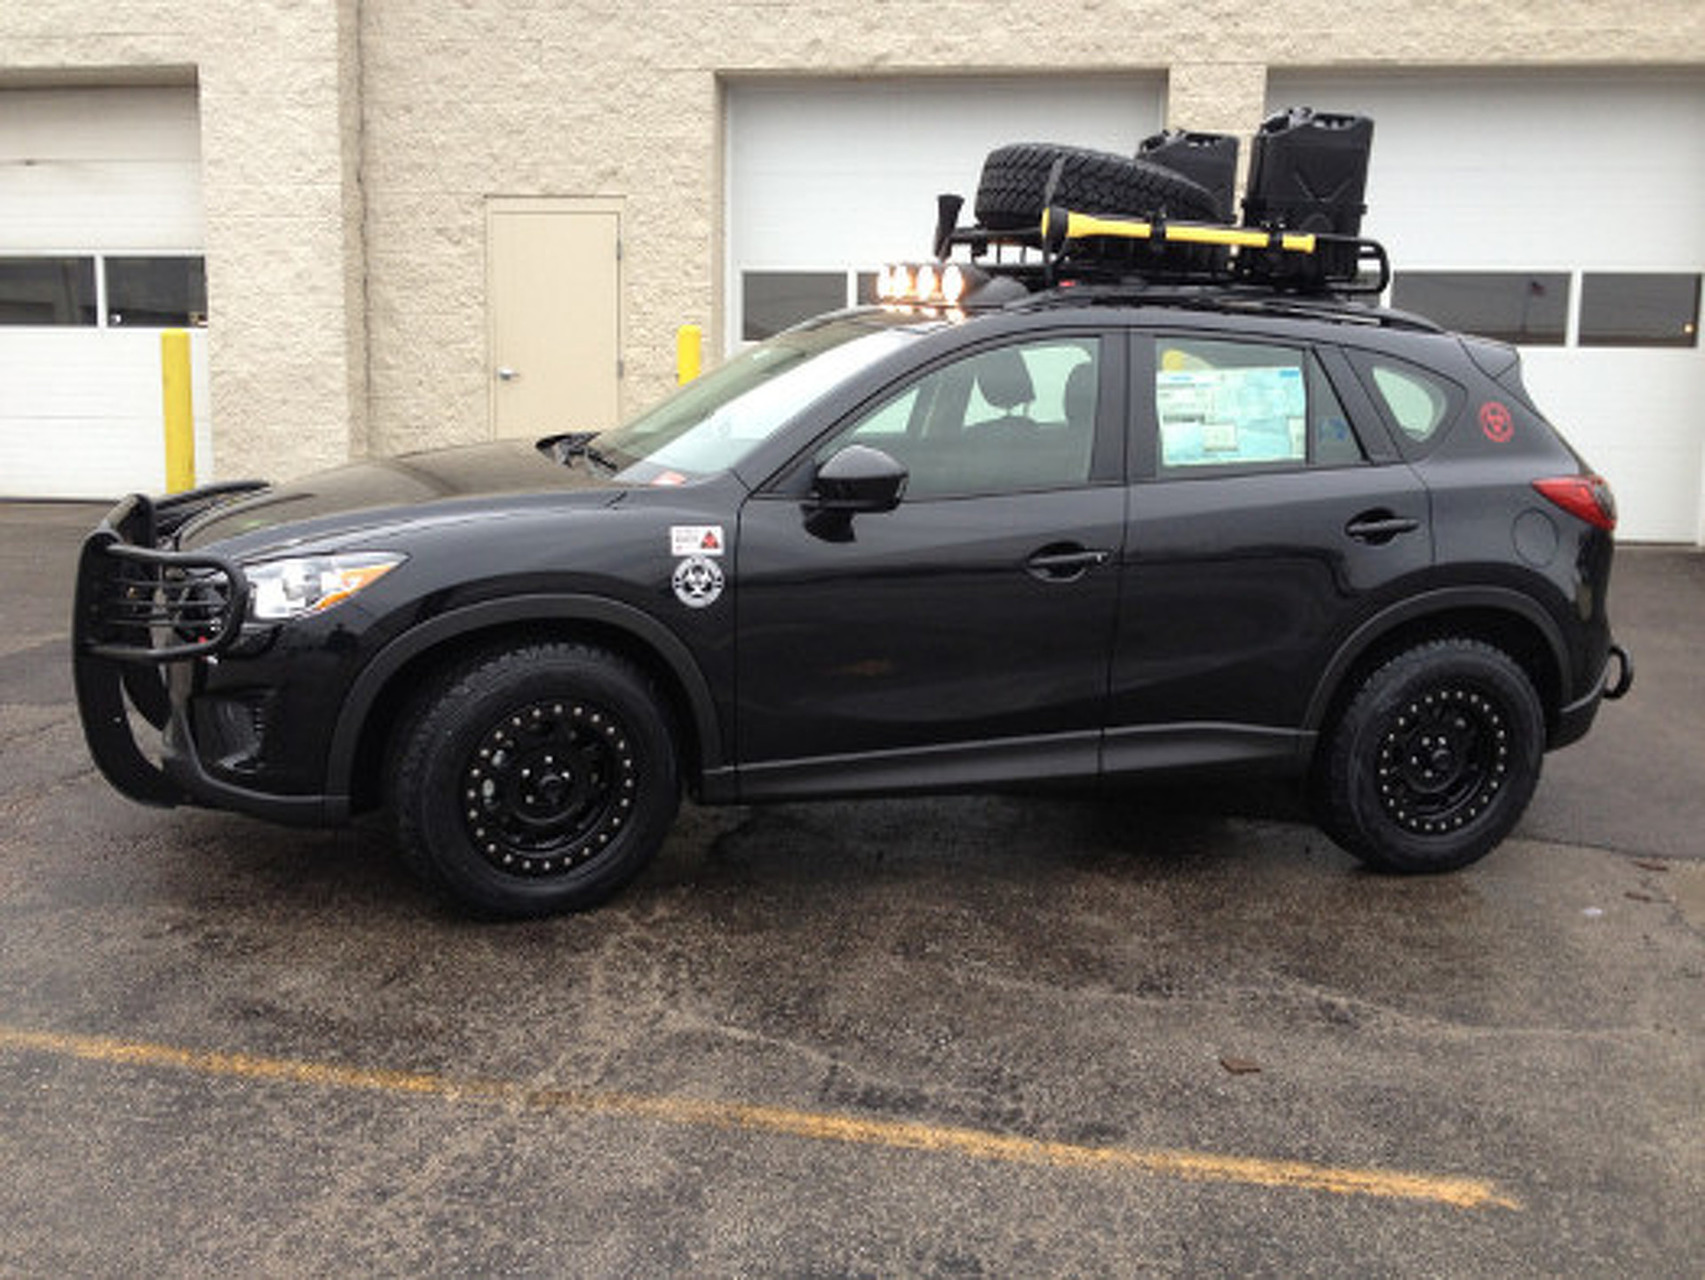 Apocalypse Ready: 2013 Mazda CX-5 Zombie Apocalypse Edition